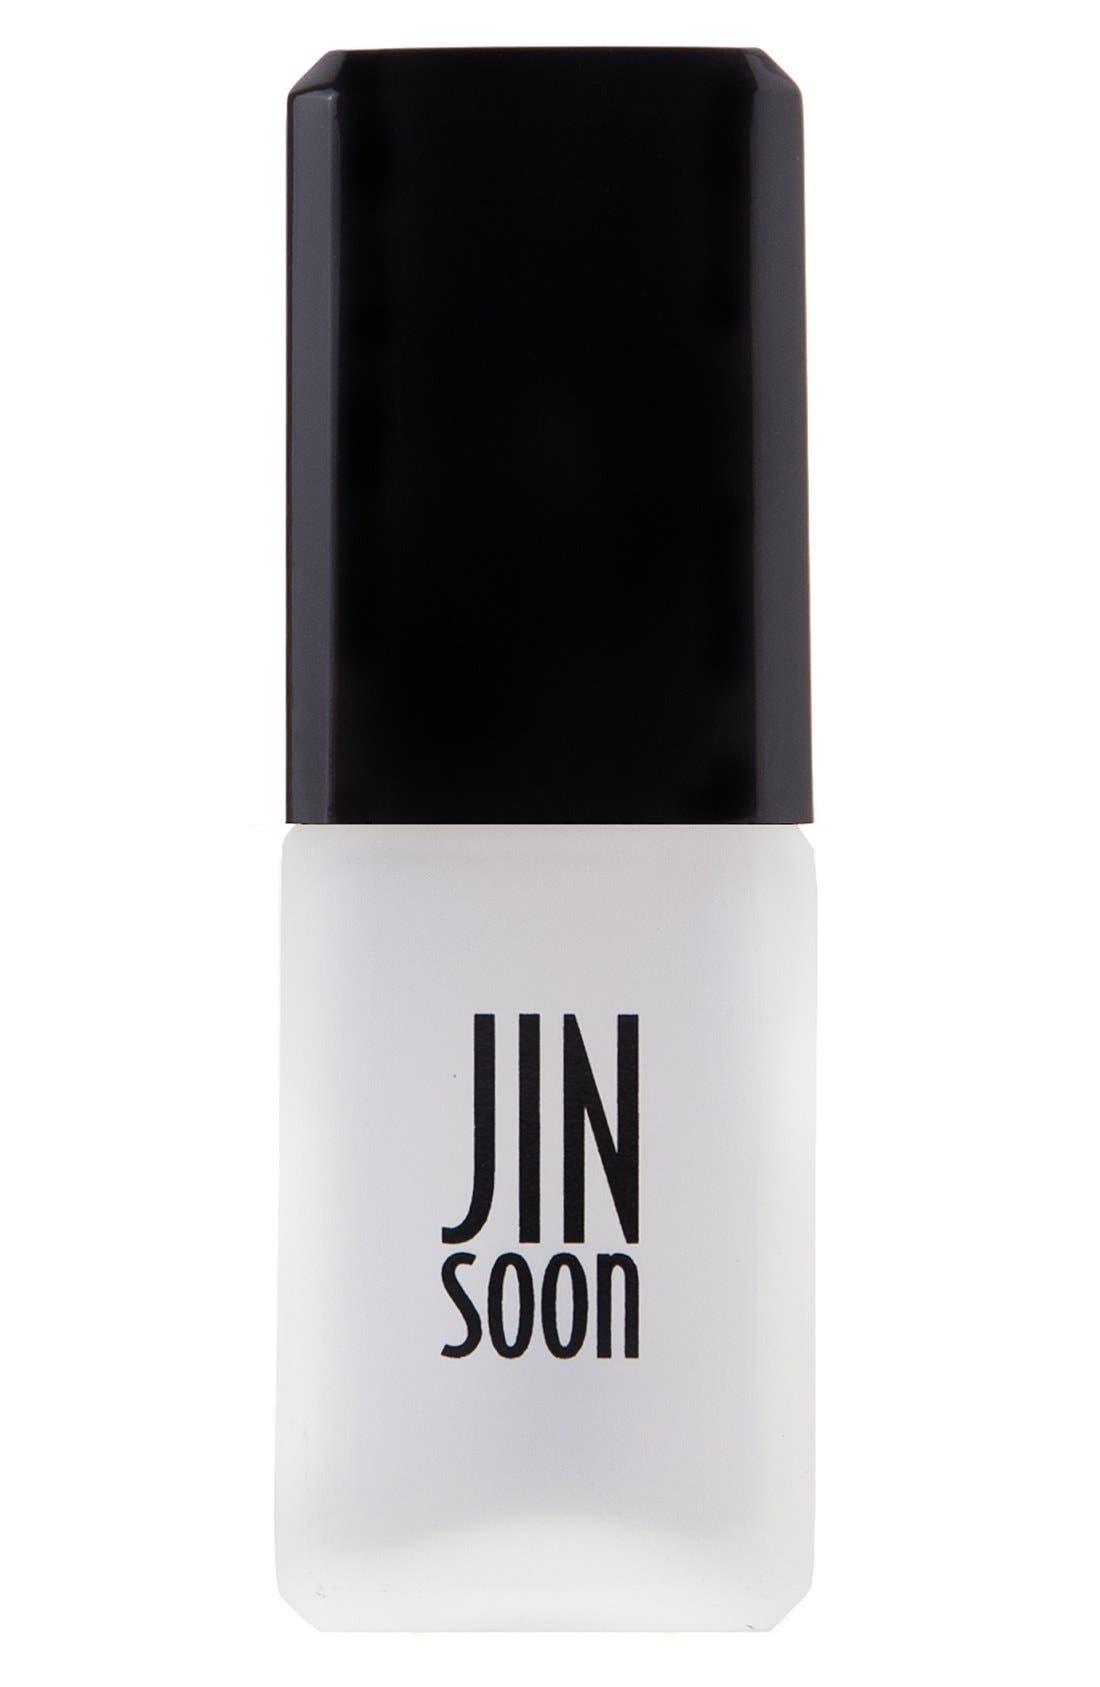 JINsoon 'Matte Maker' Top Coat